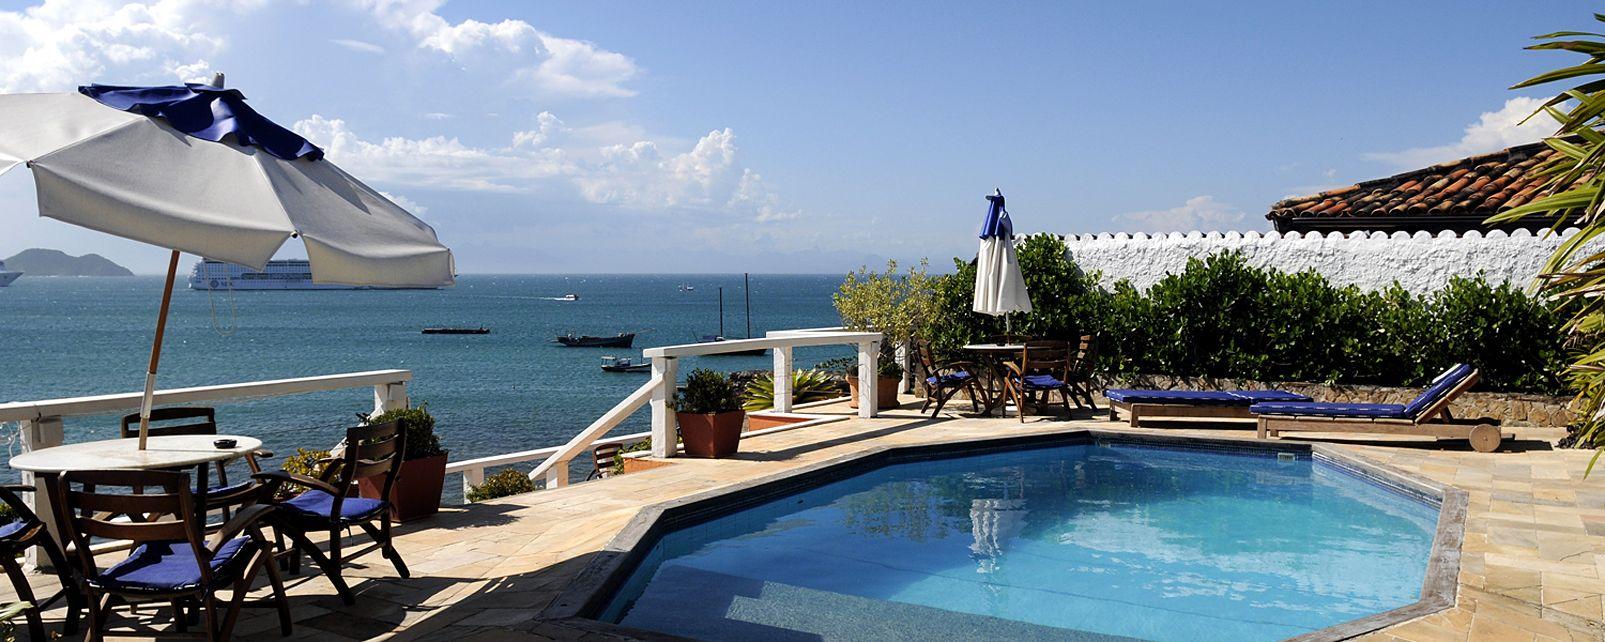 Hotel Pousada Byblos